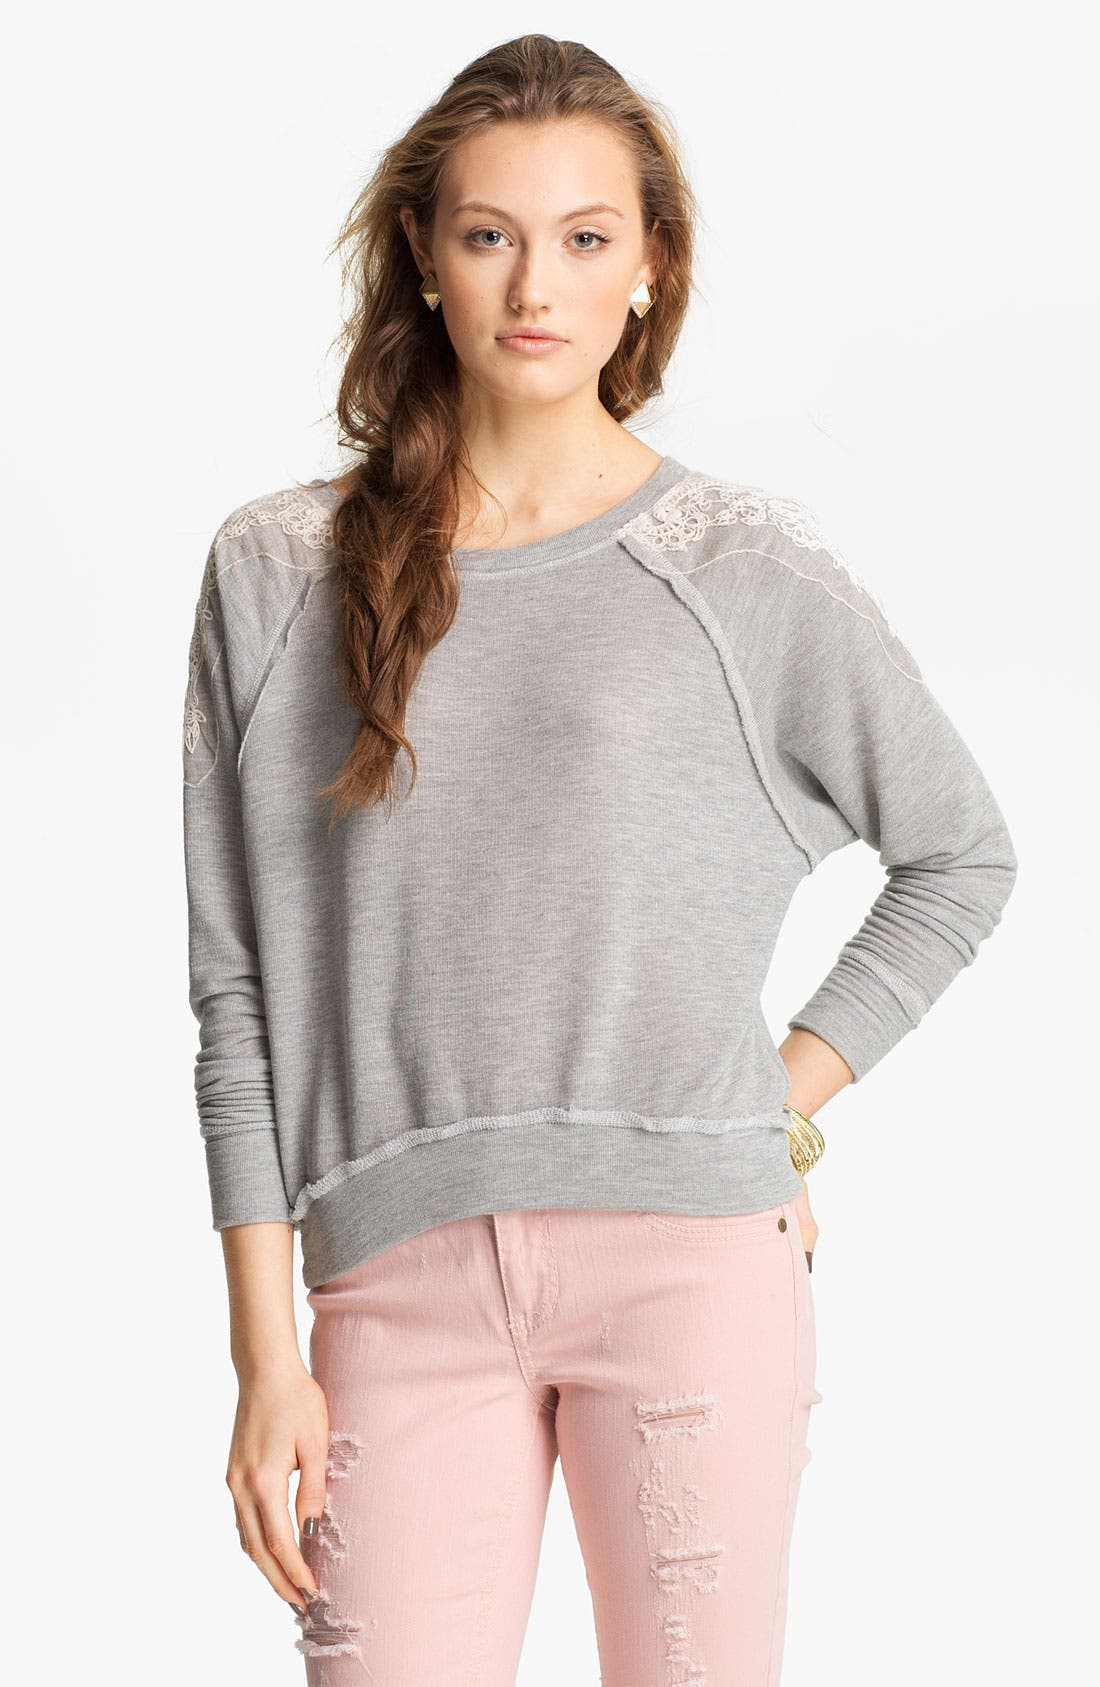 Alternate Image 1 Selected - Ten Sixty Sherman Lace Appliqué Sweater (Juniors)